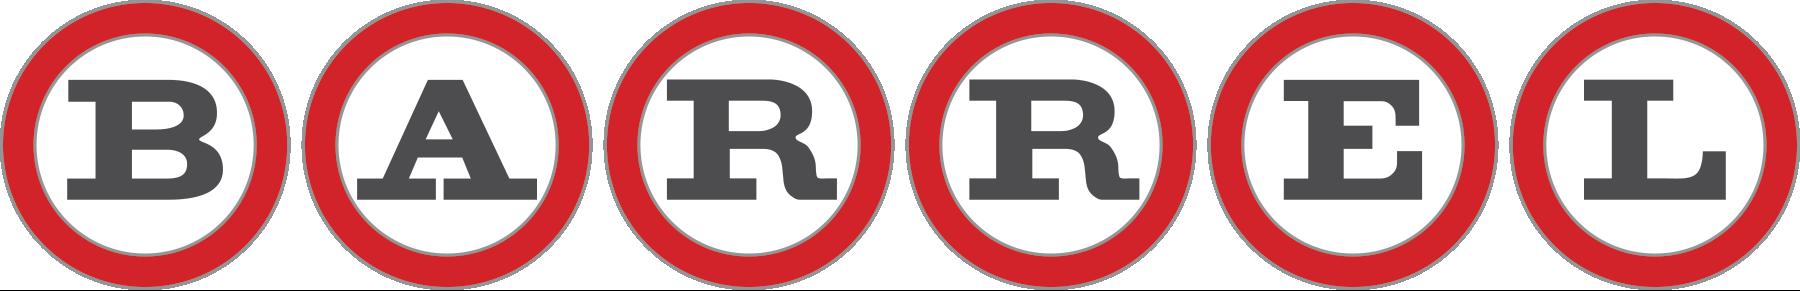 barrel-okc-logo-wide.png